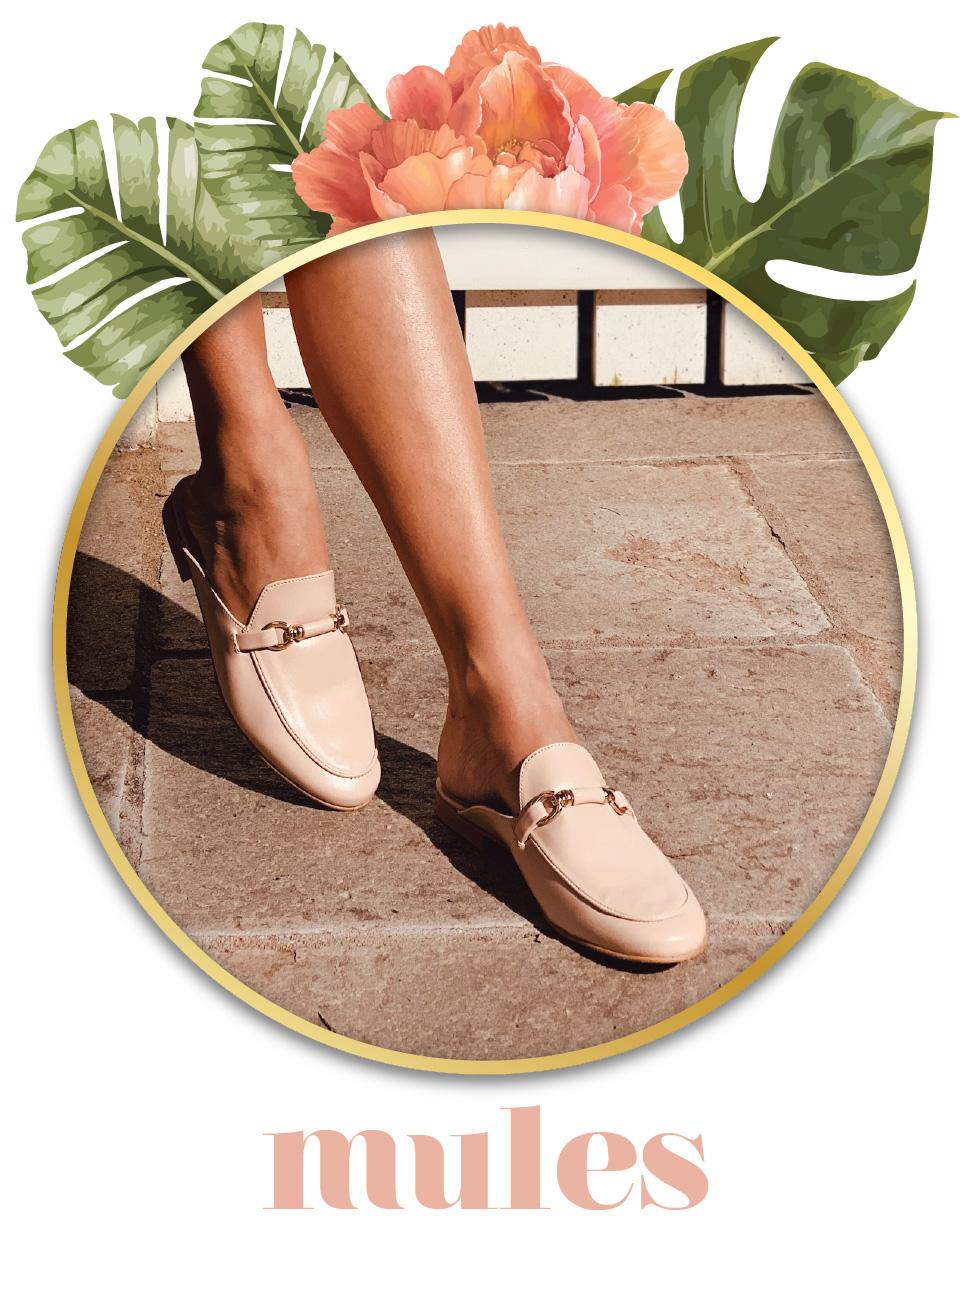 bc50ed811eb Arte Piedi Γυναικεία Παπούτσια - Ρούχα - Αξεσουάρ